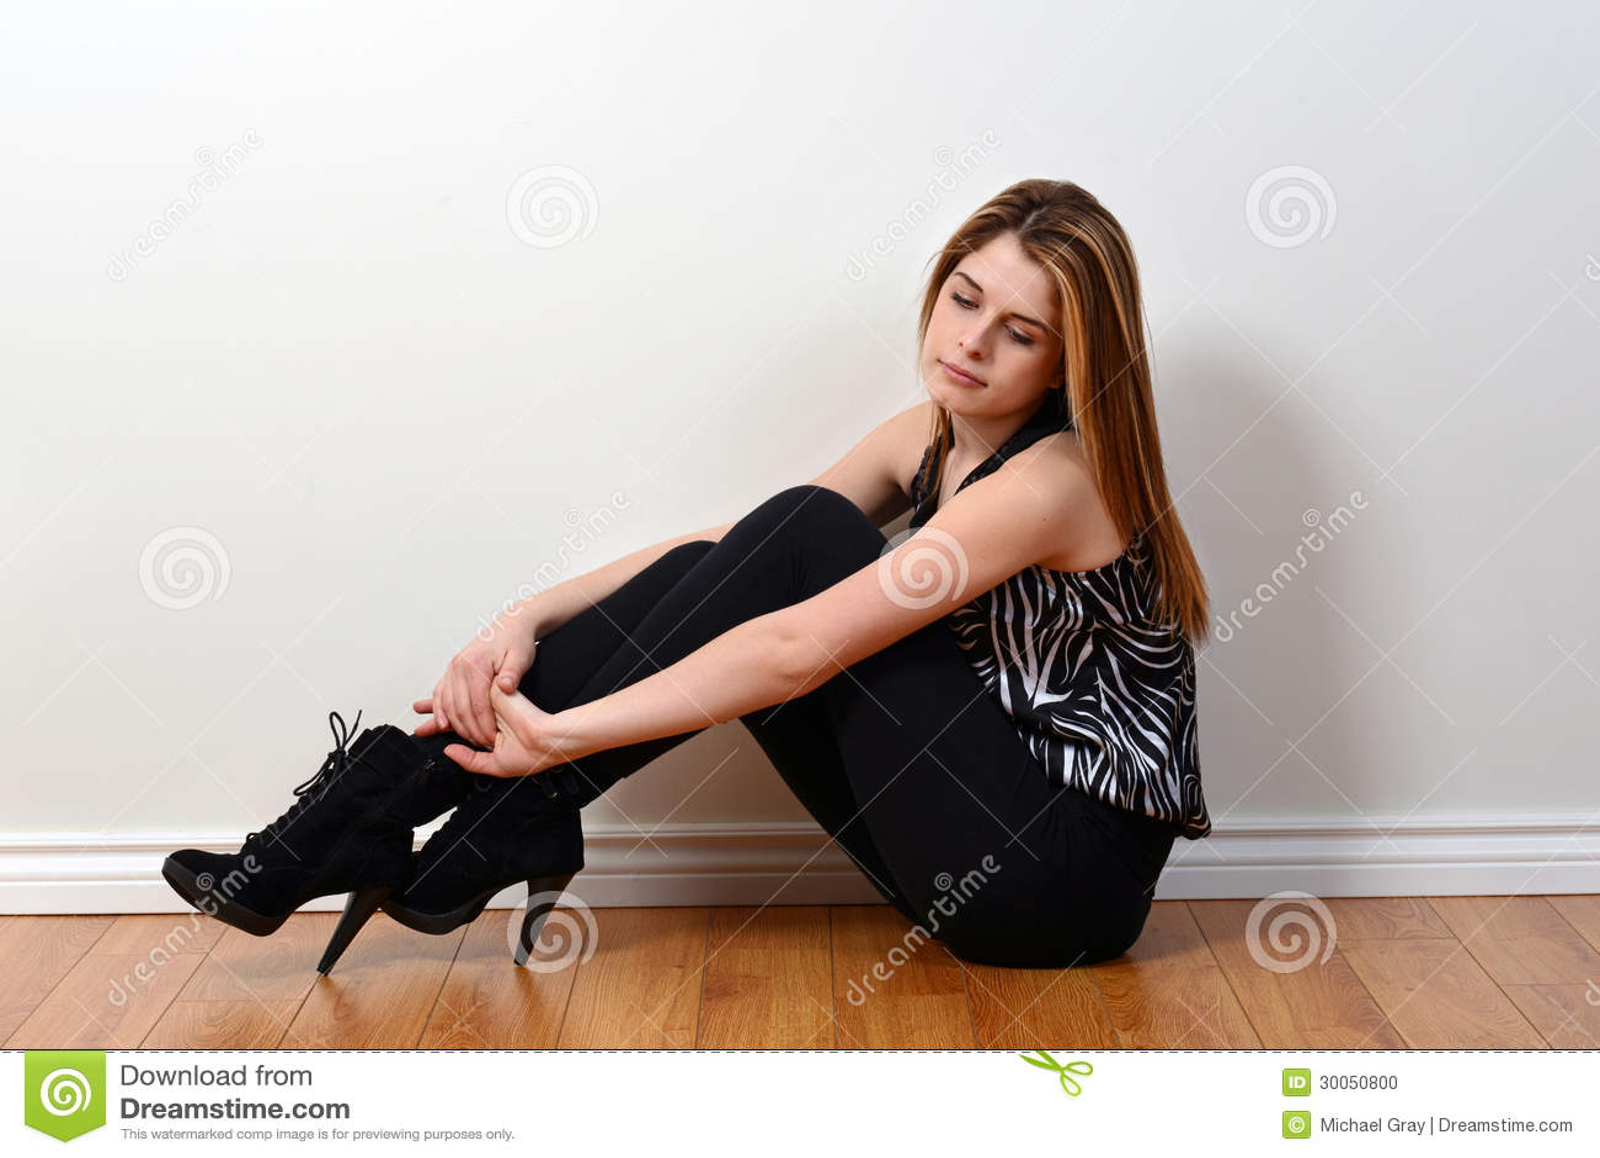 Teen Fashion Model Sitting Stock Photo  Image 30050800